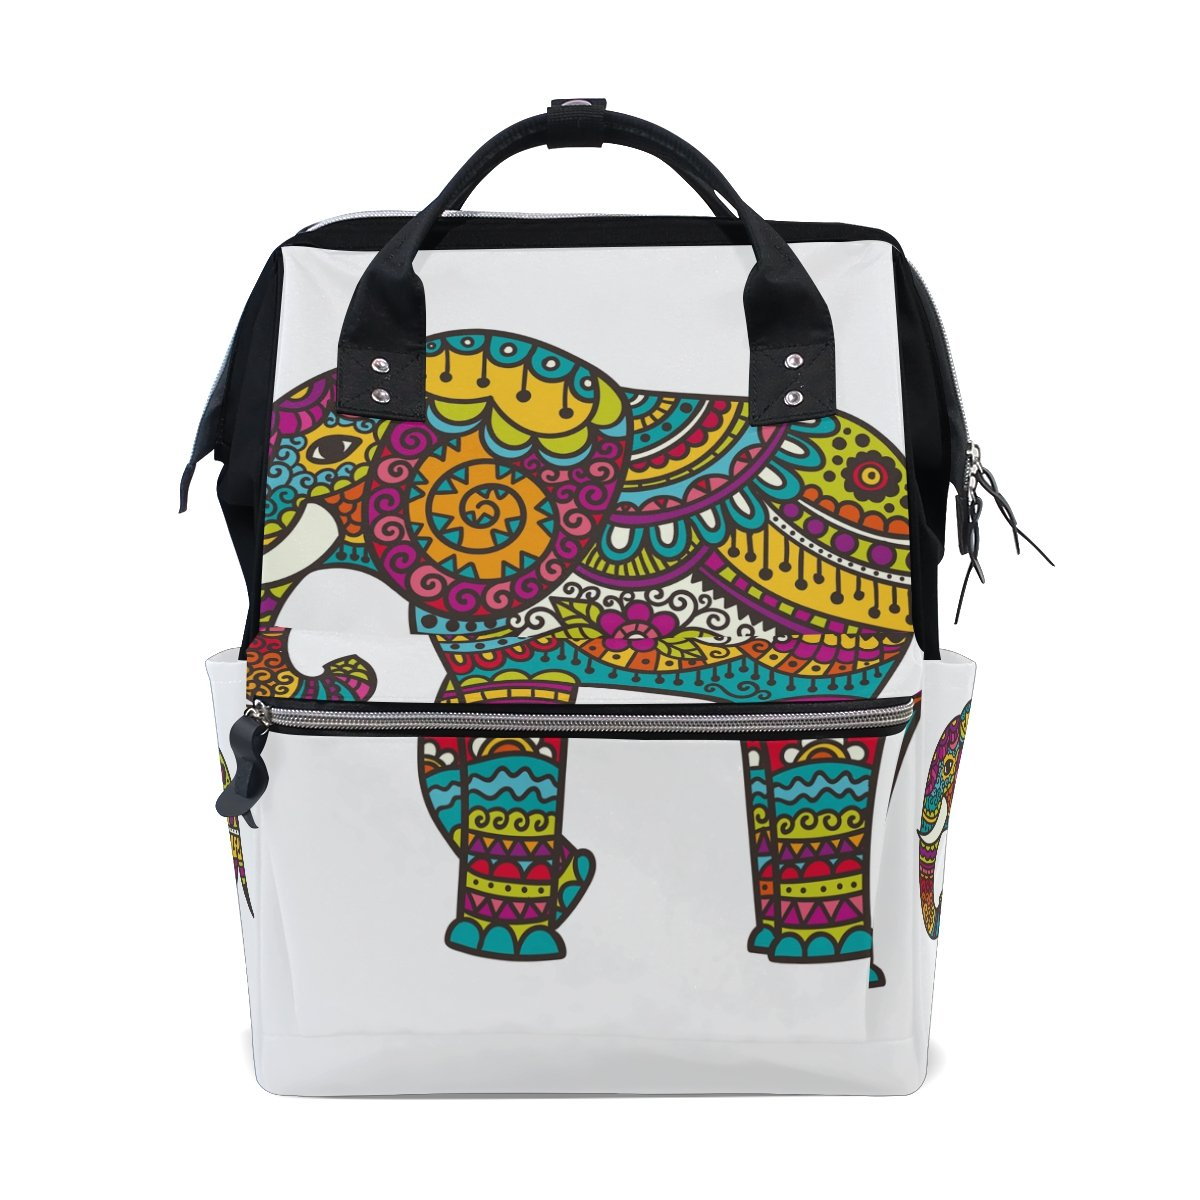 JSTeLノートカレッジバッグ学生旅行Elephantフラワースクールバックパックショルダートートバッグ   B078MJ7719